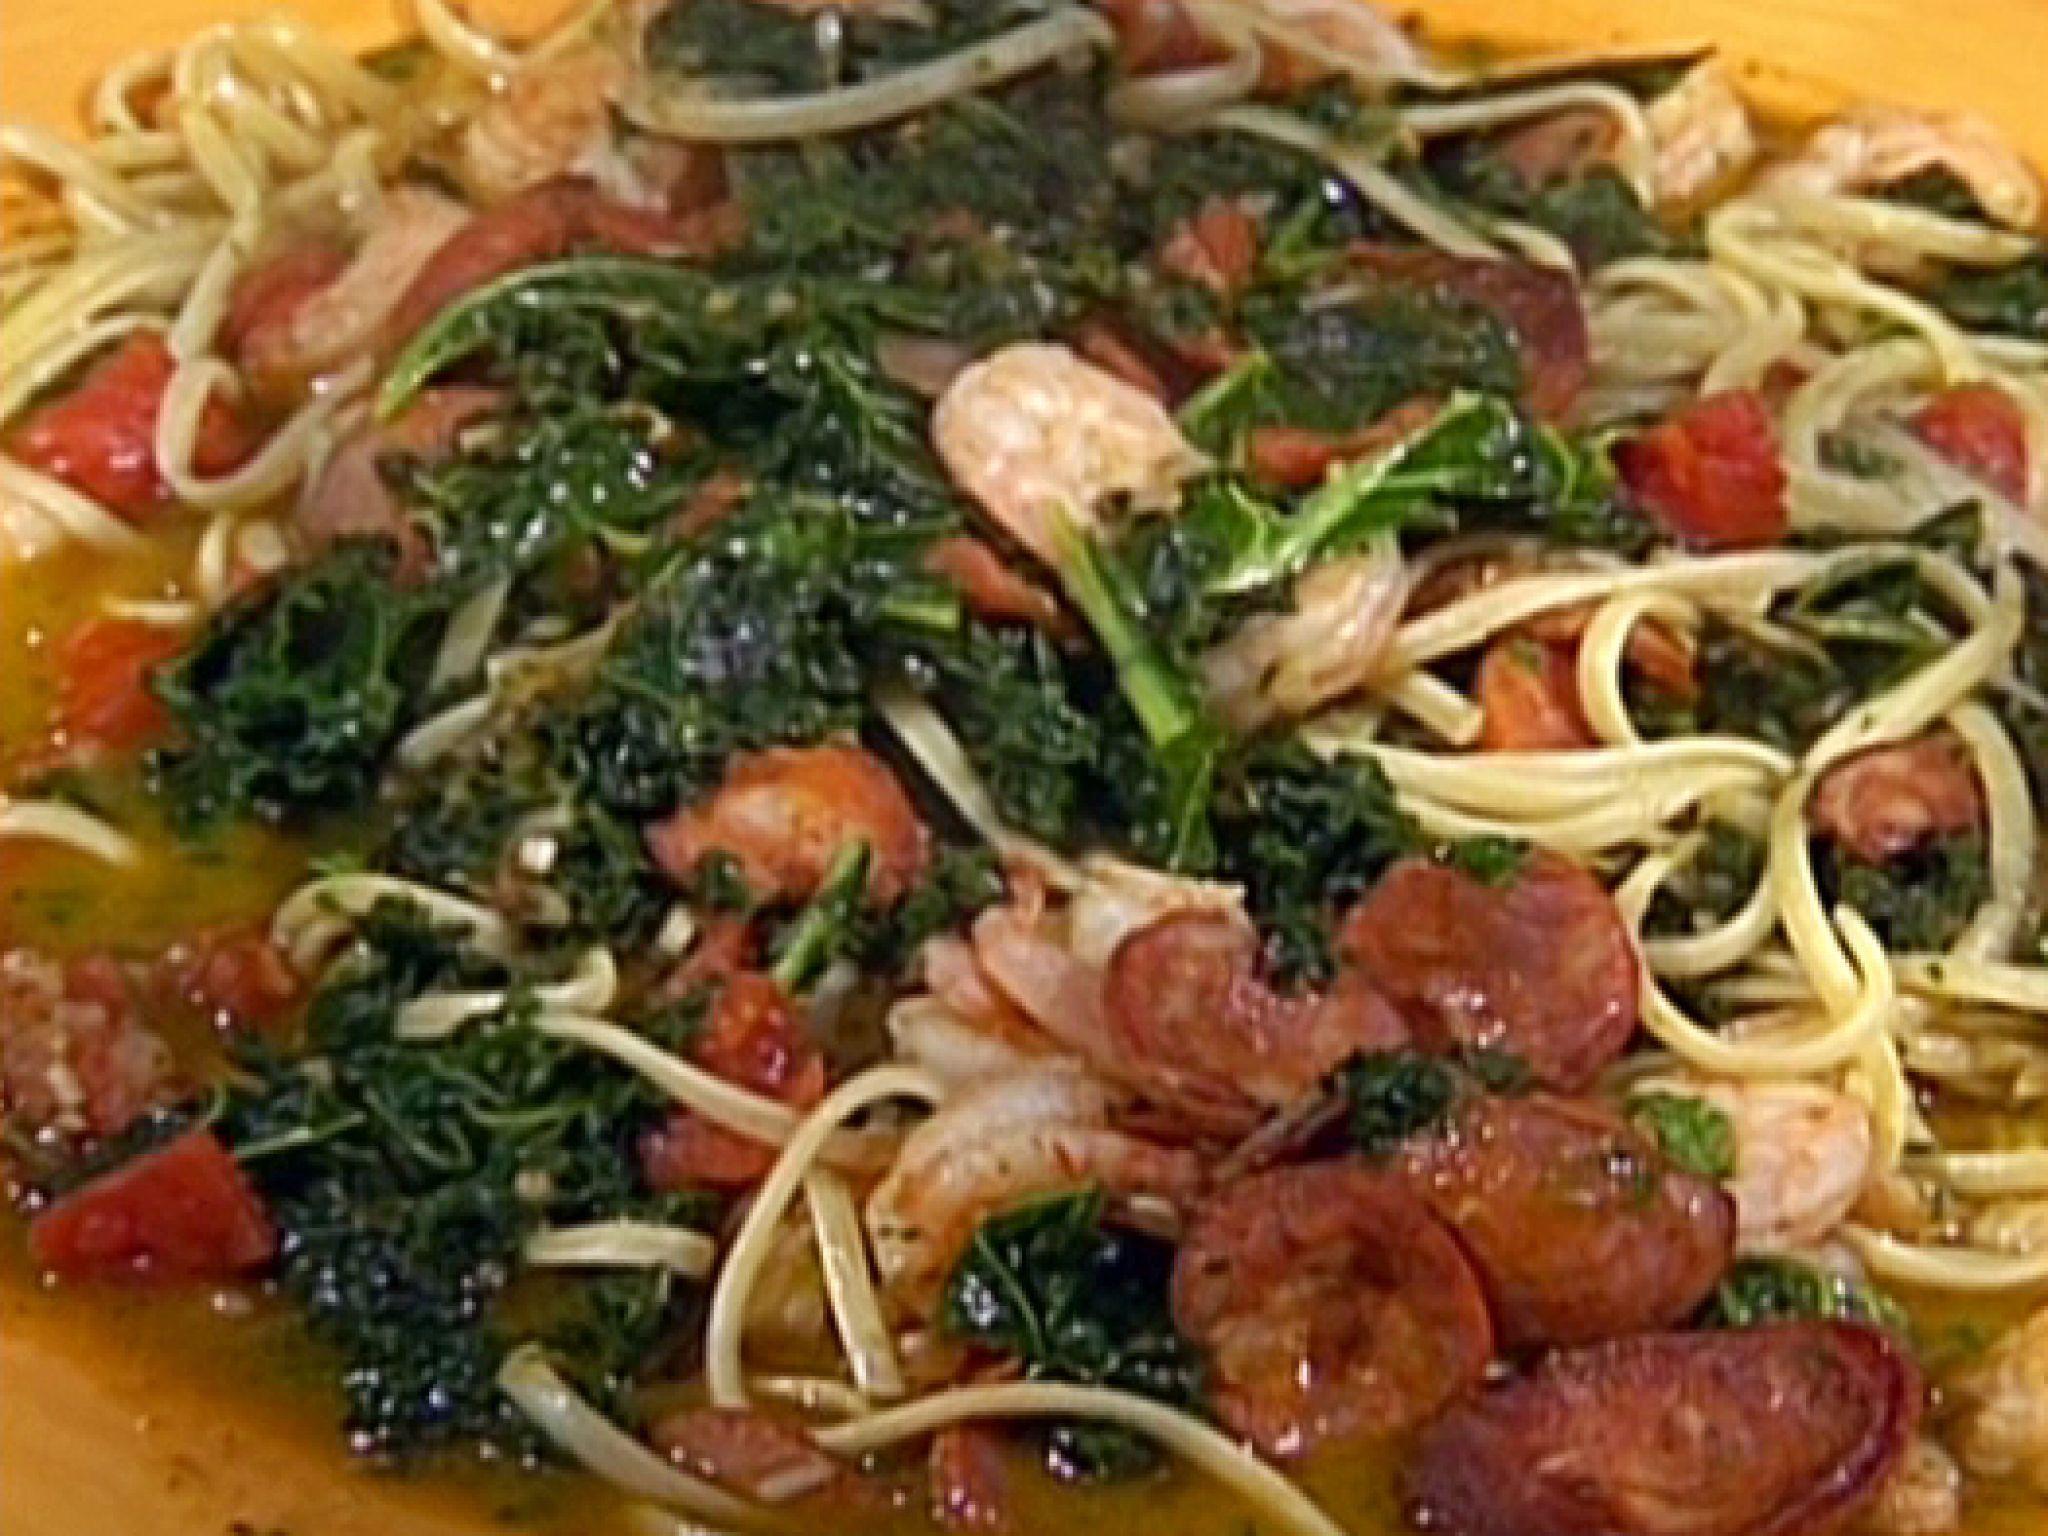 Healthy Shrimp Pasta Recipes Food Network  Emeril s Portuguese Shrimp and Pasta recipe from Emeril